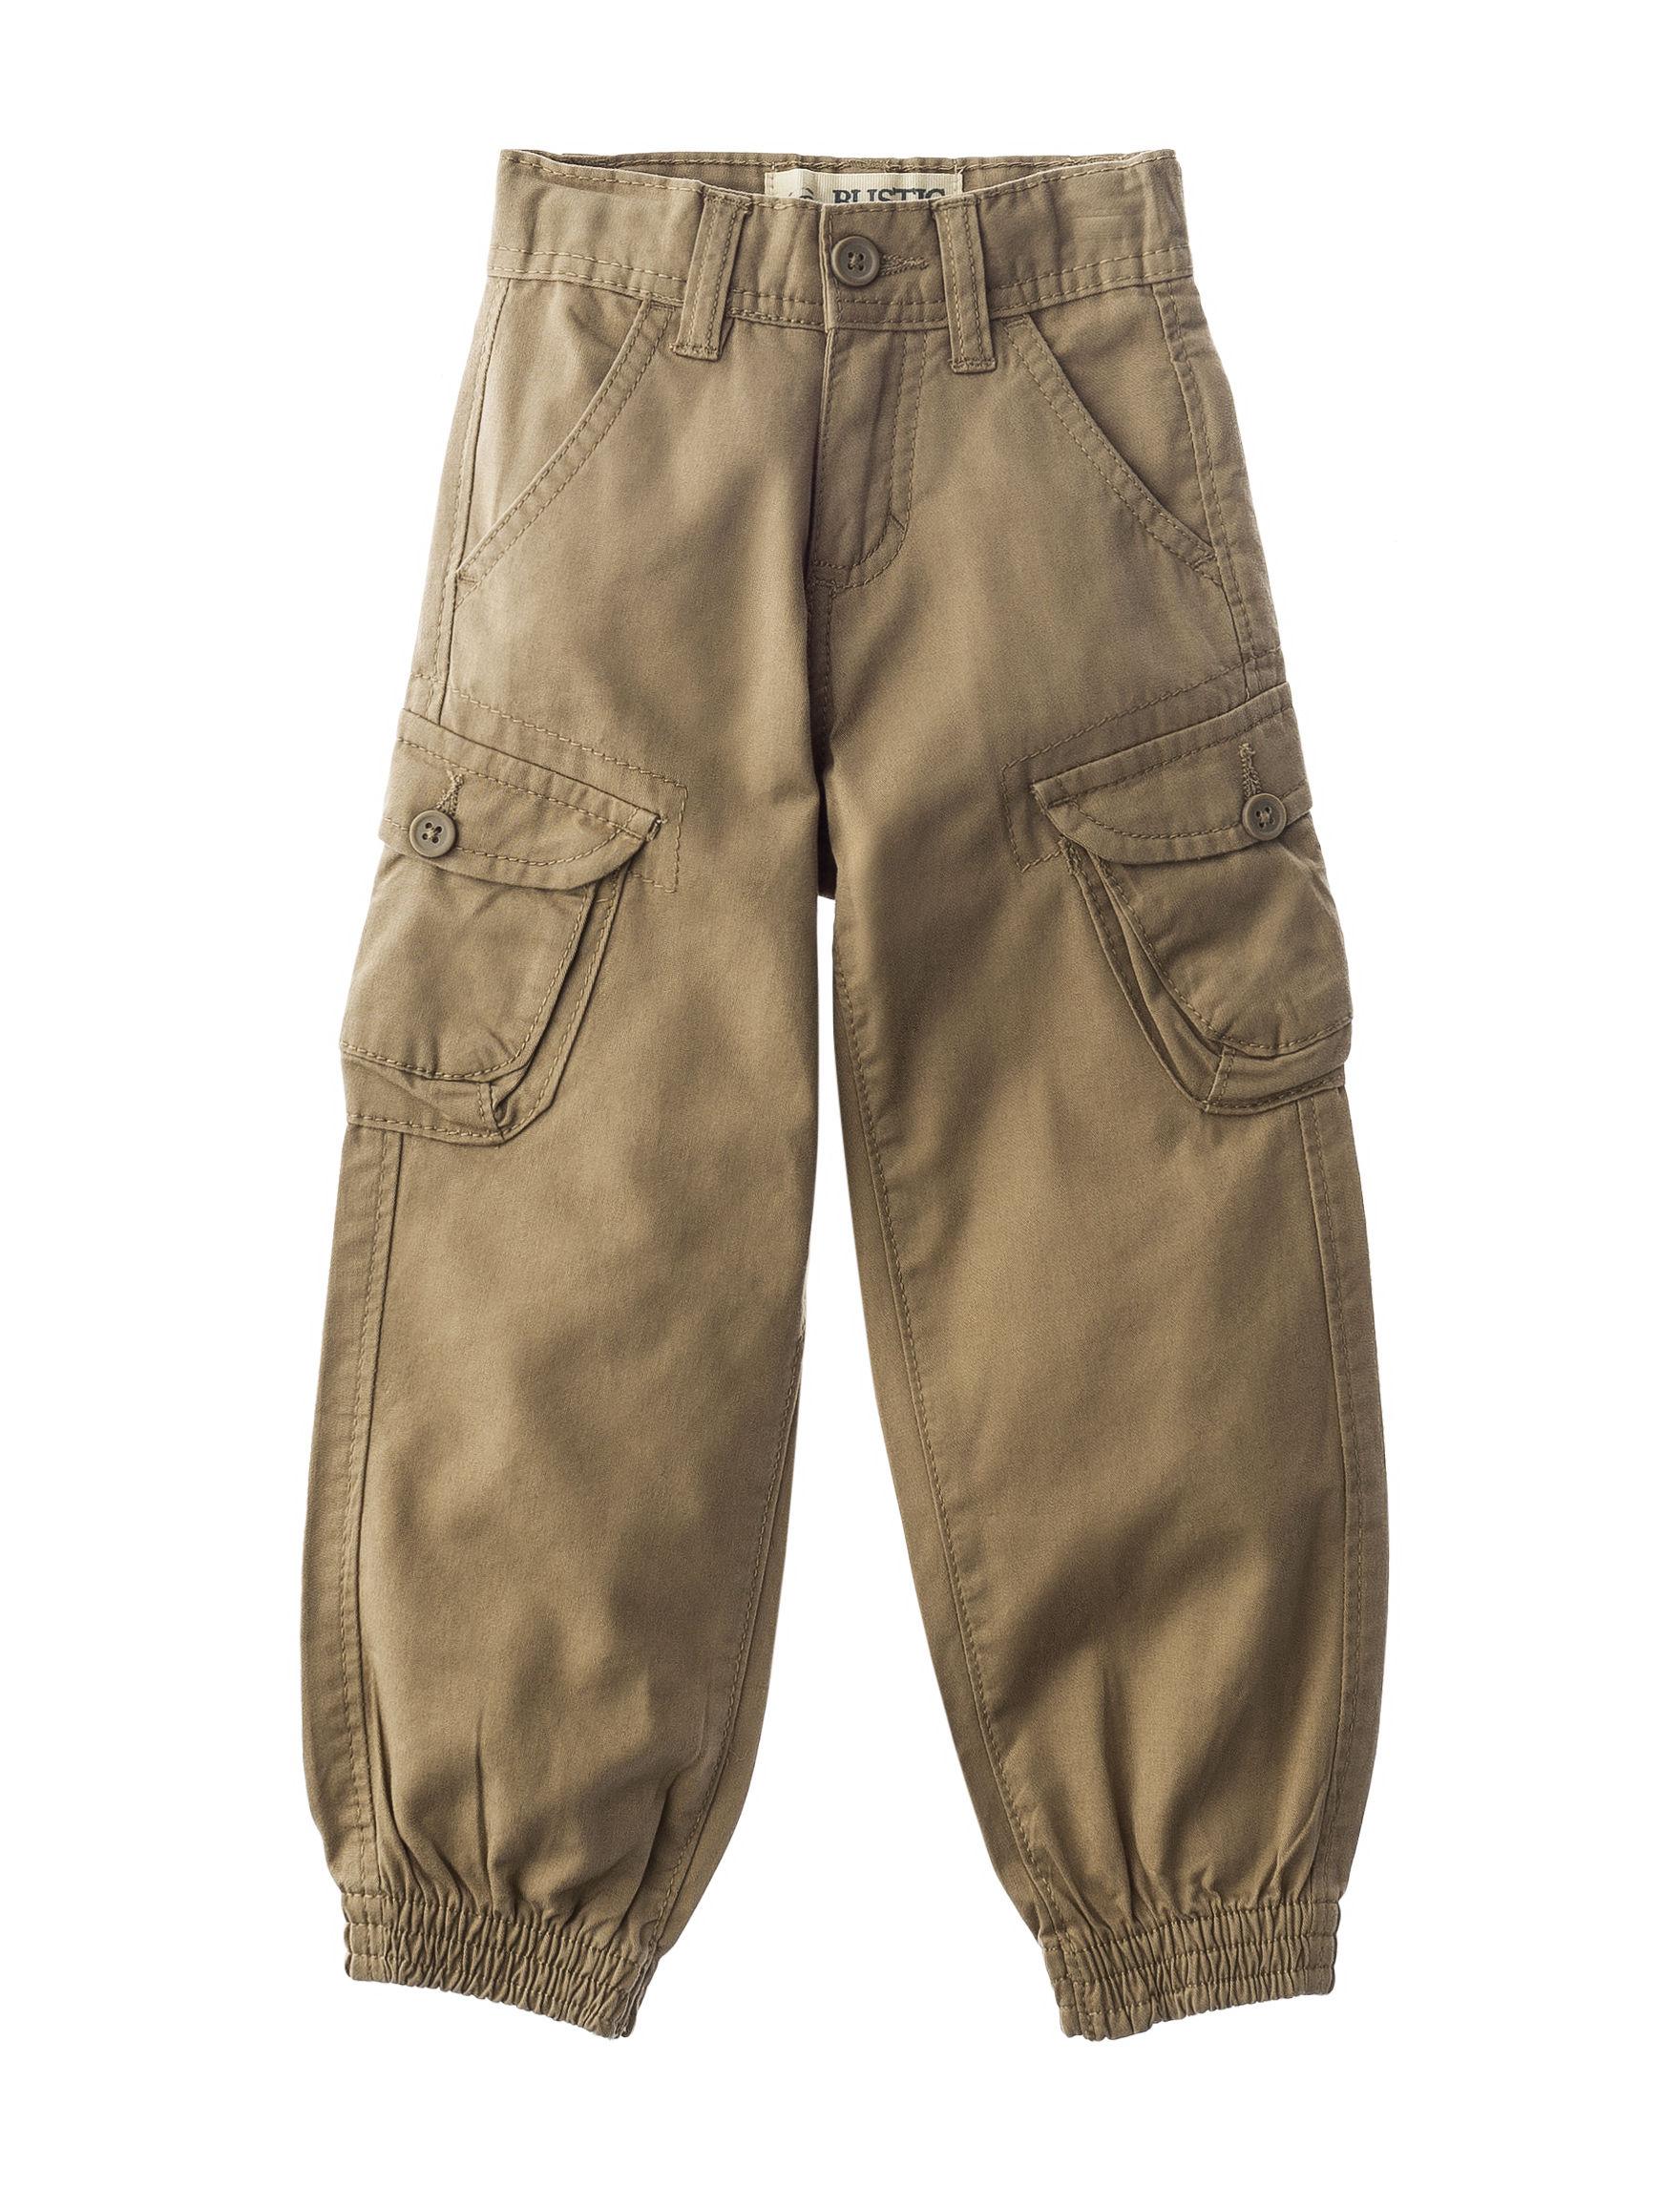 Rustic Blue Camel Soft Pants